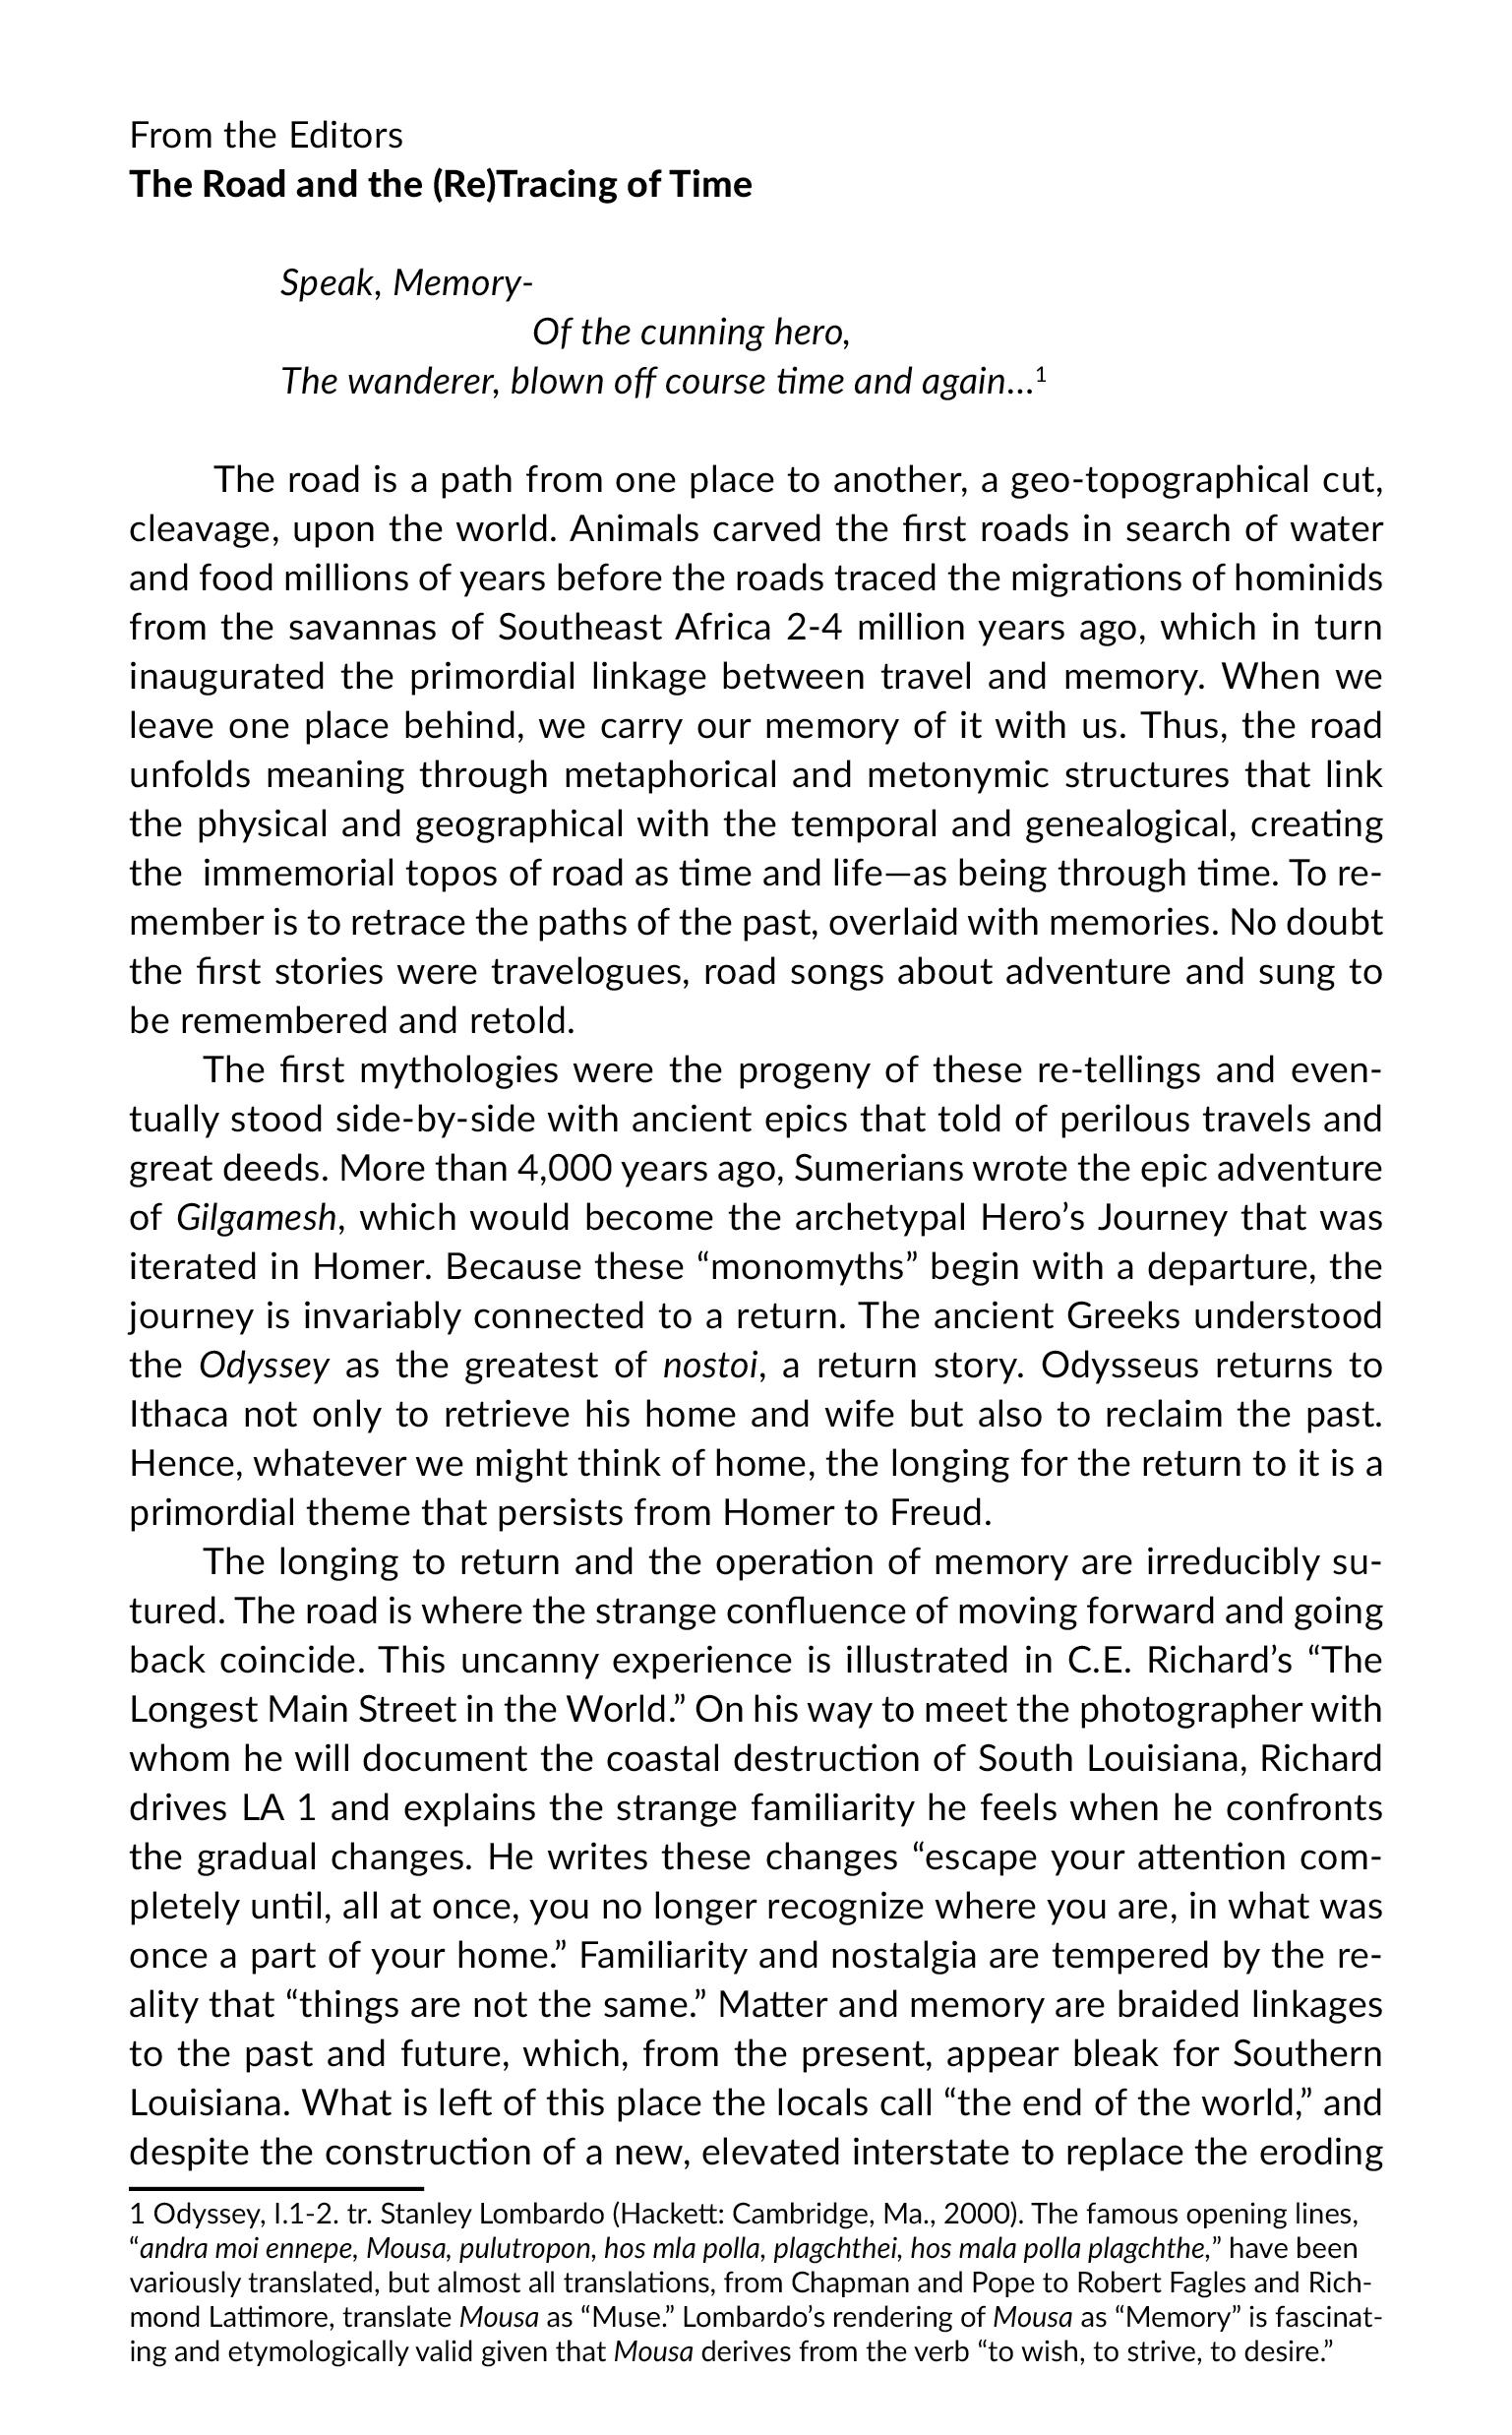 inrot page 1.jpg